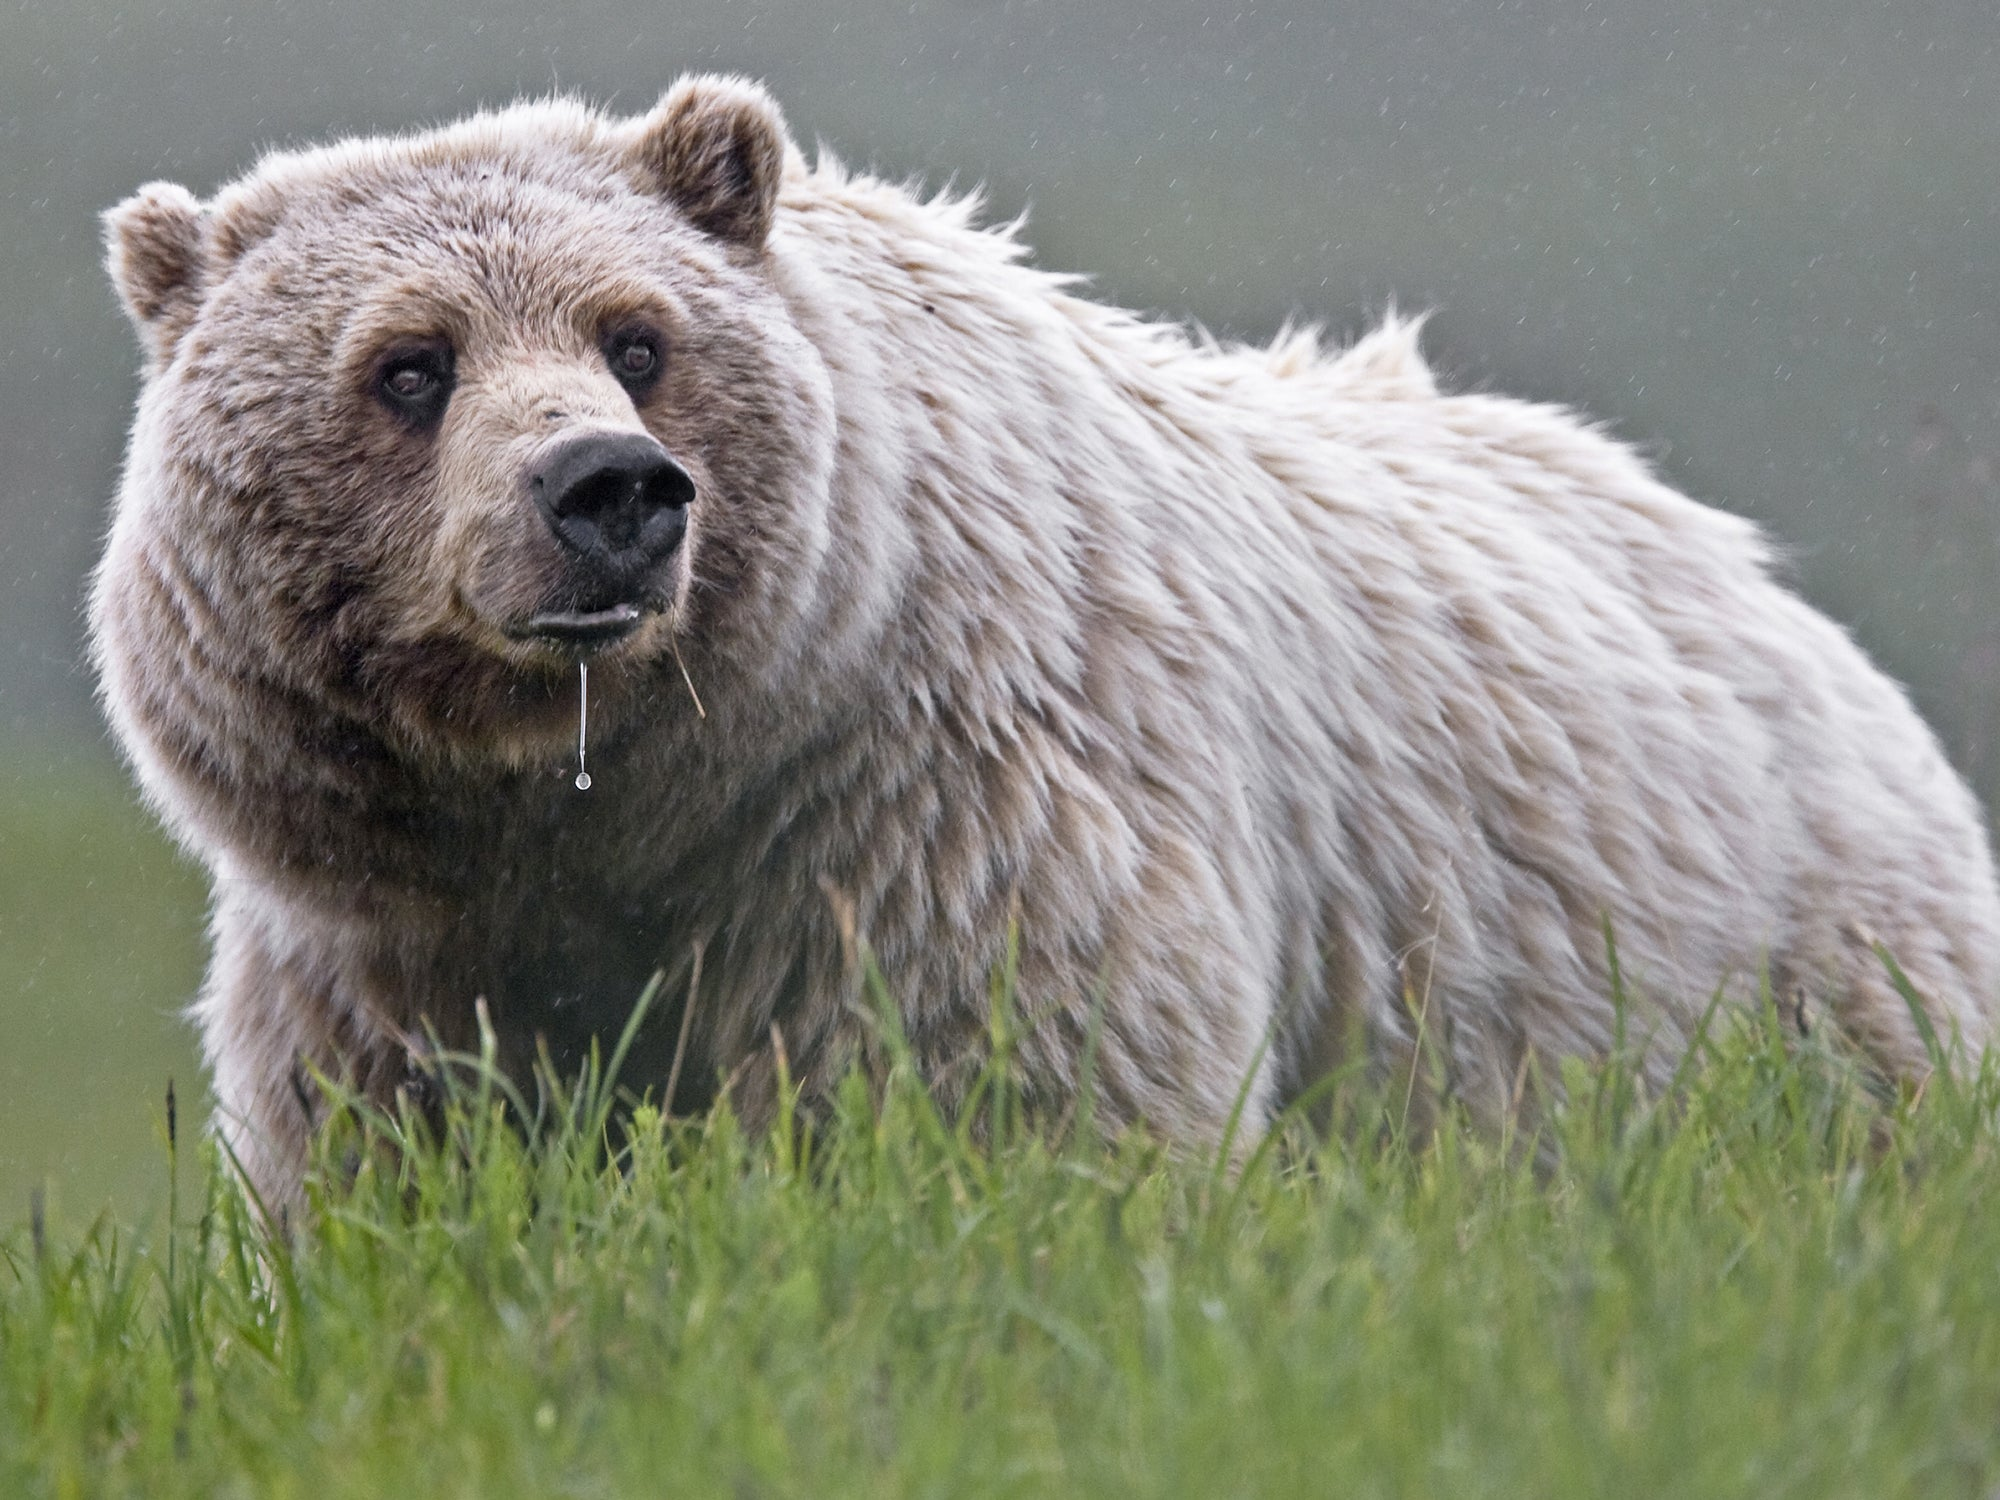 yellowstone grizzlies delisting